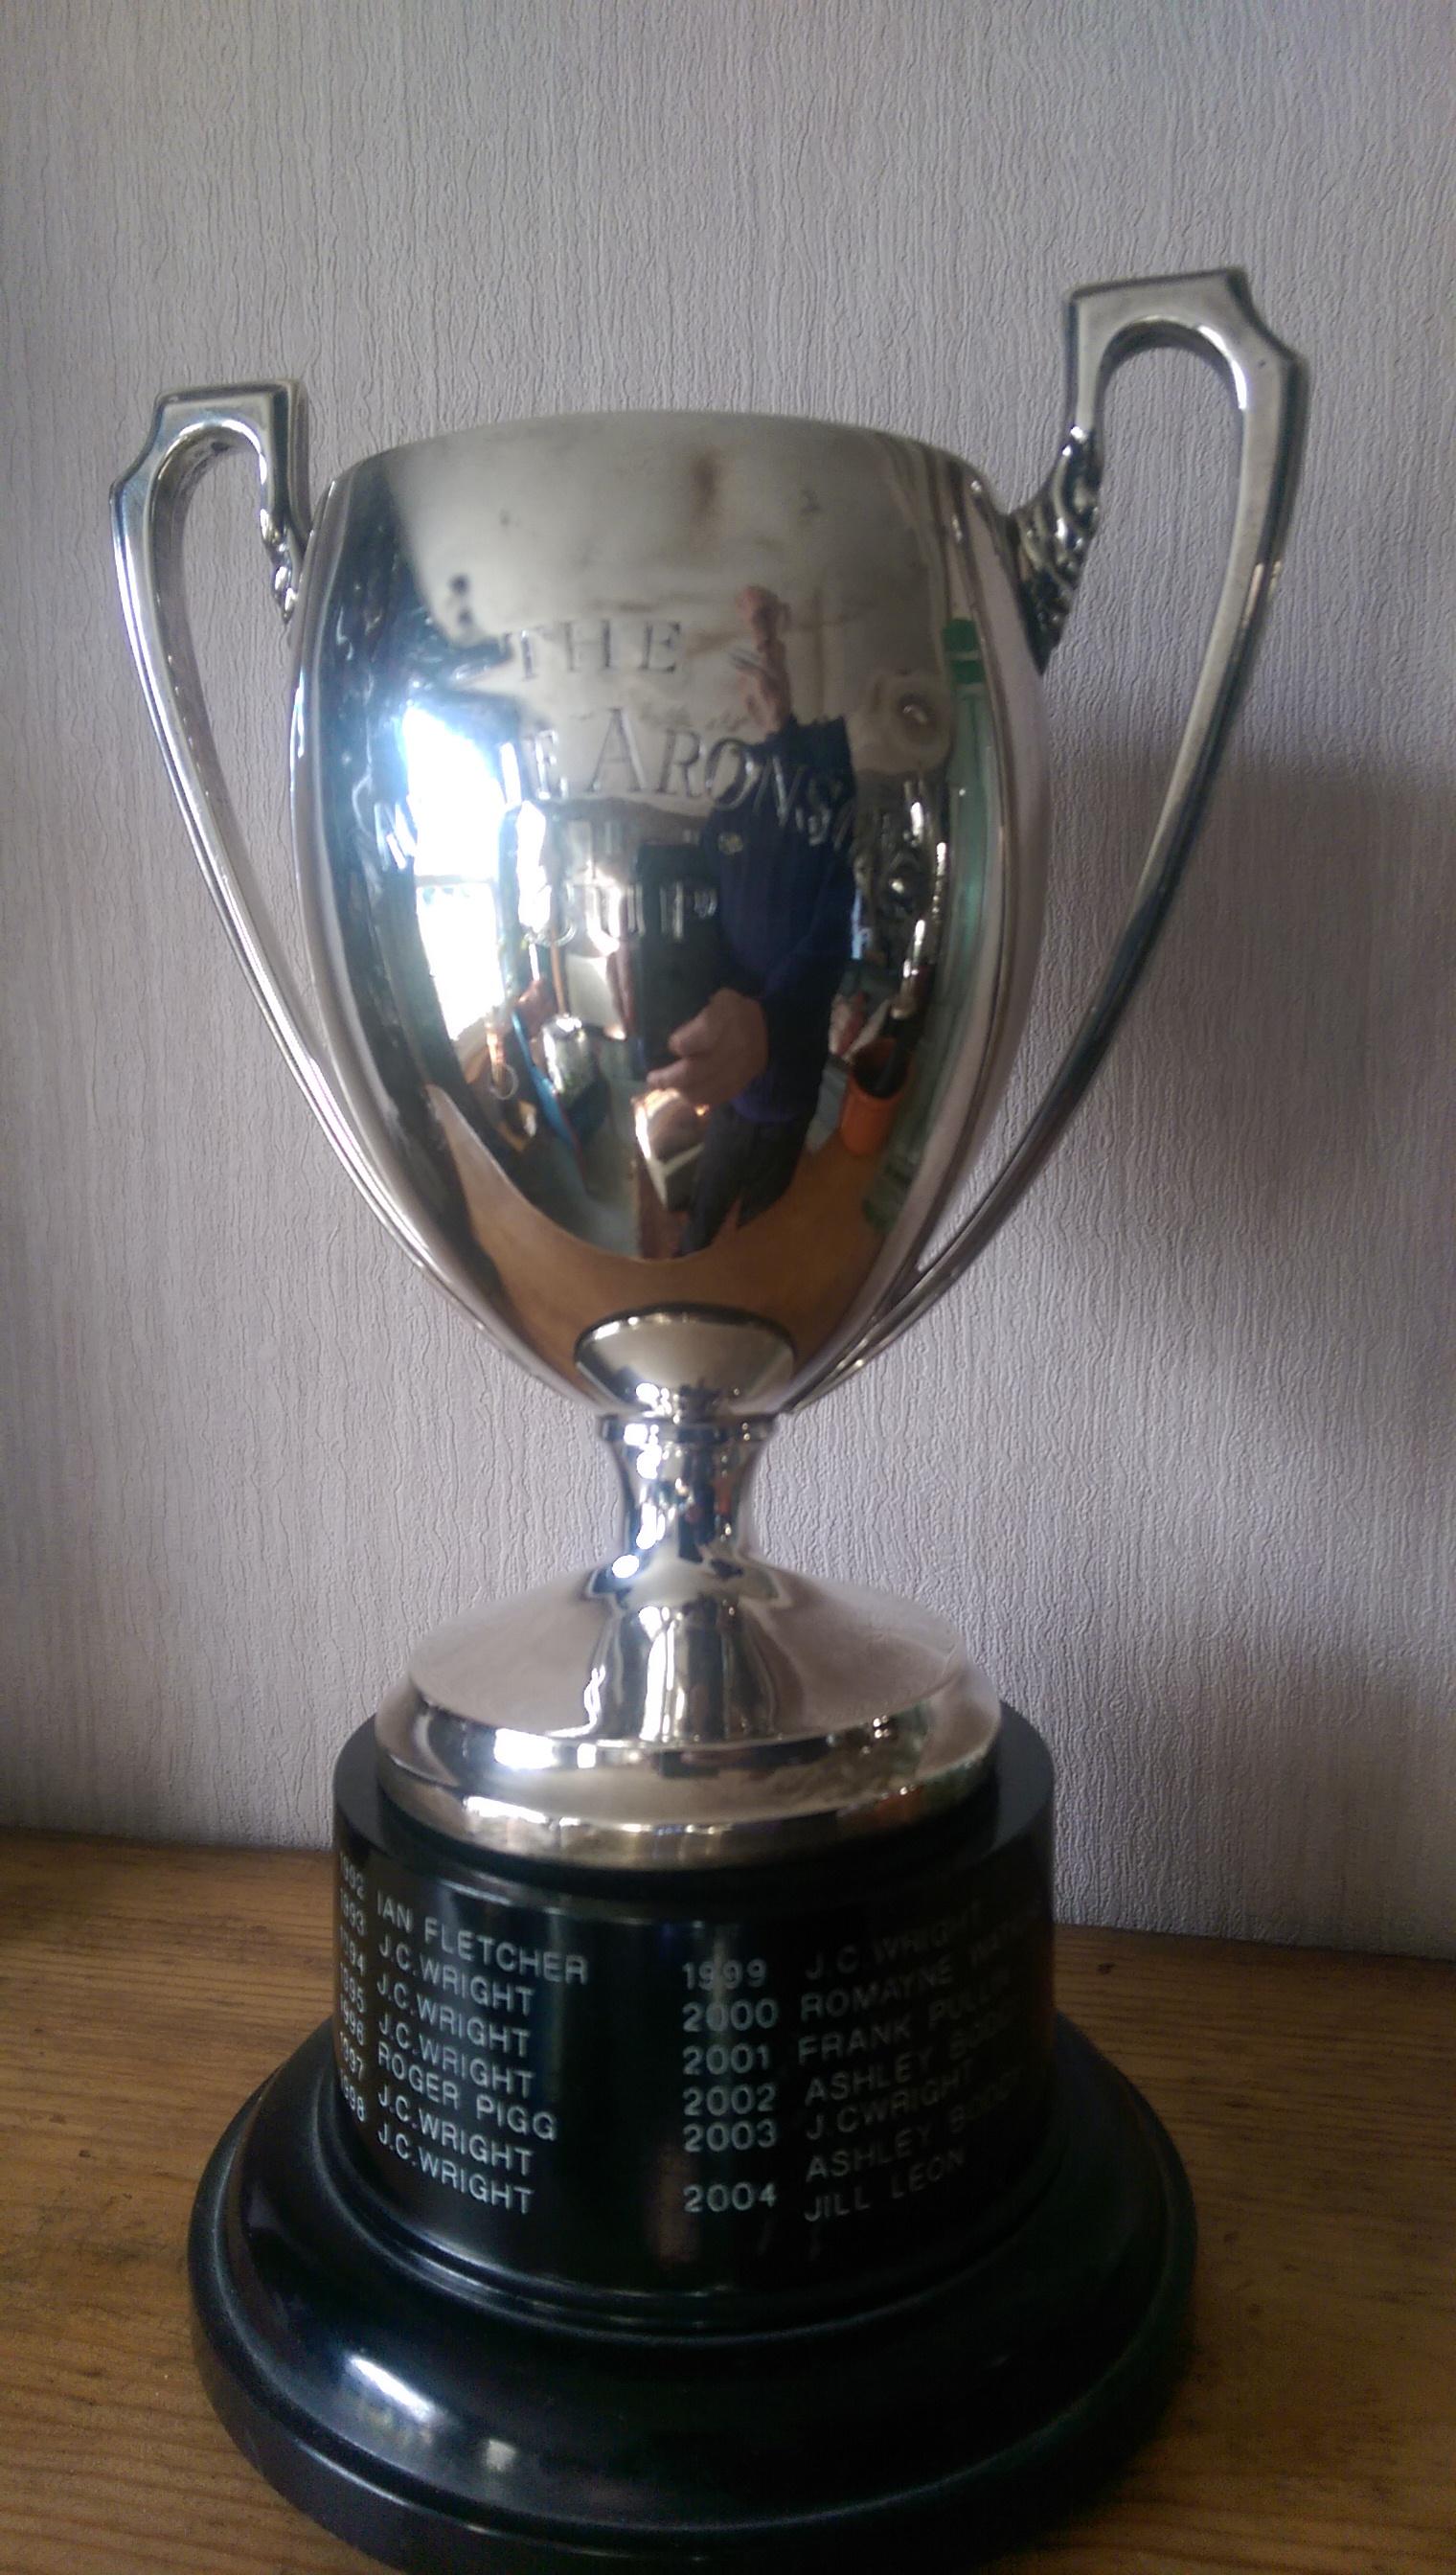 MOLLIE ARONSON CUP